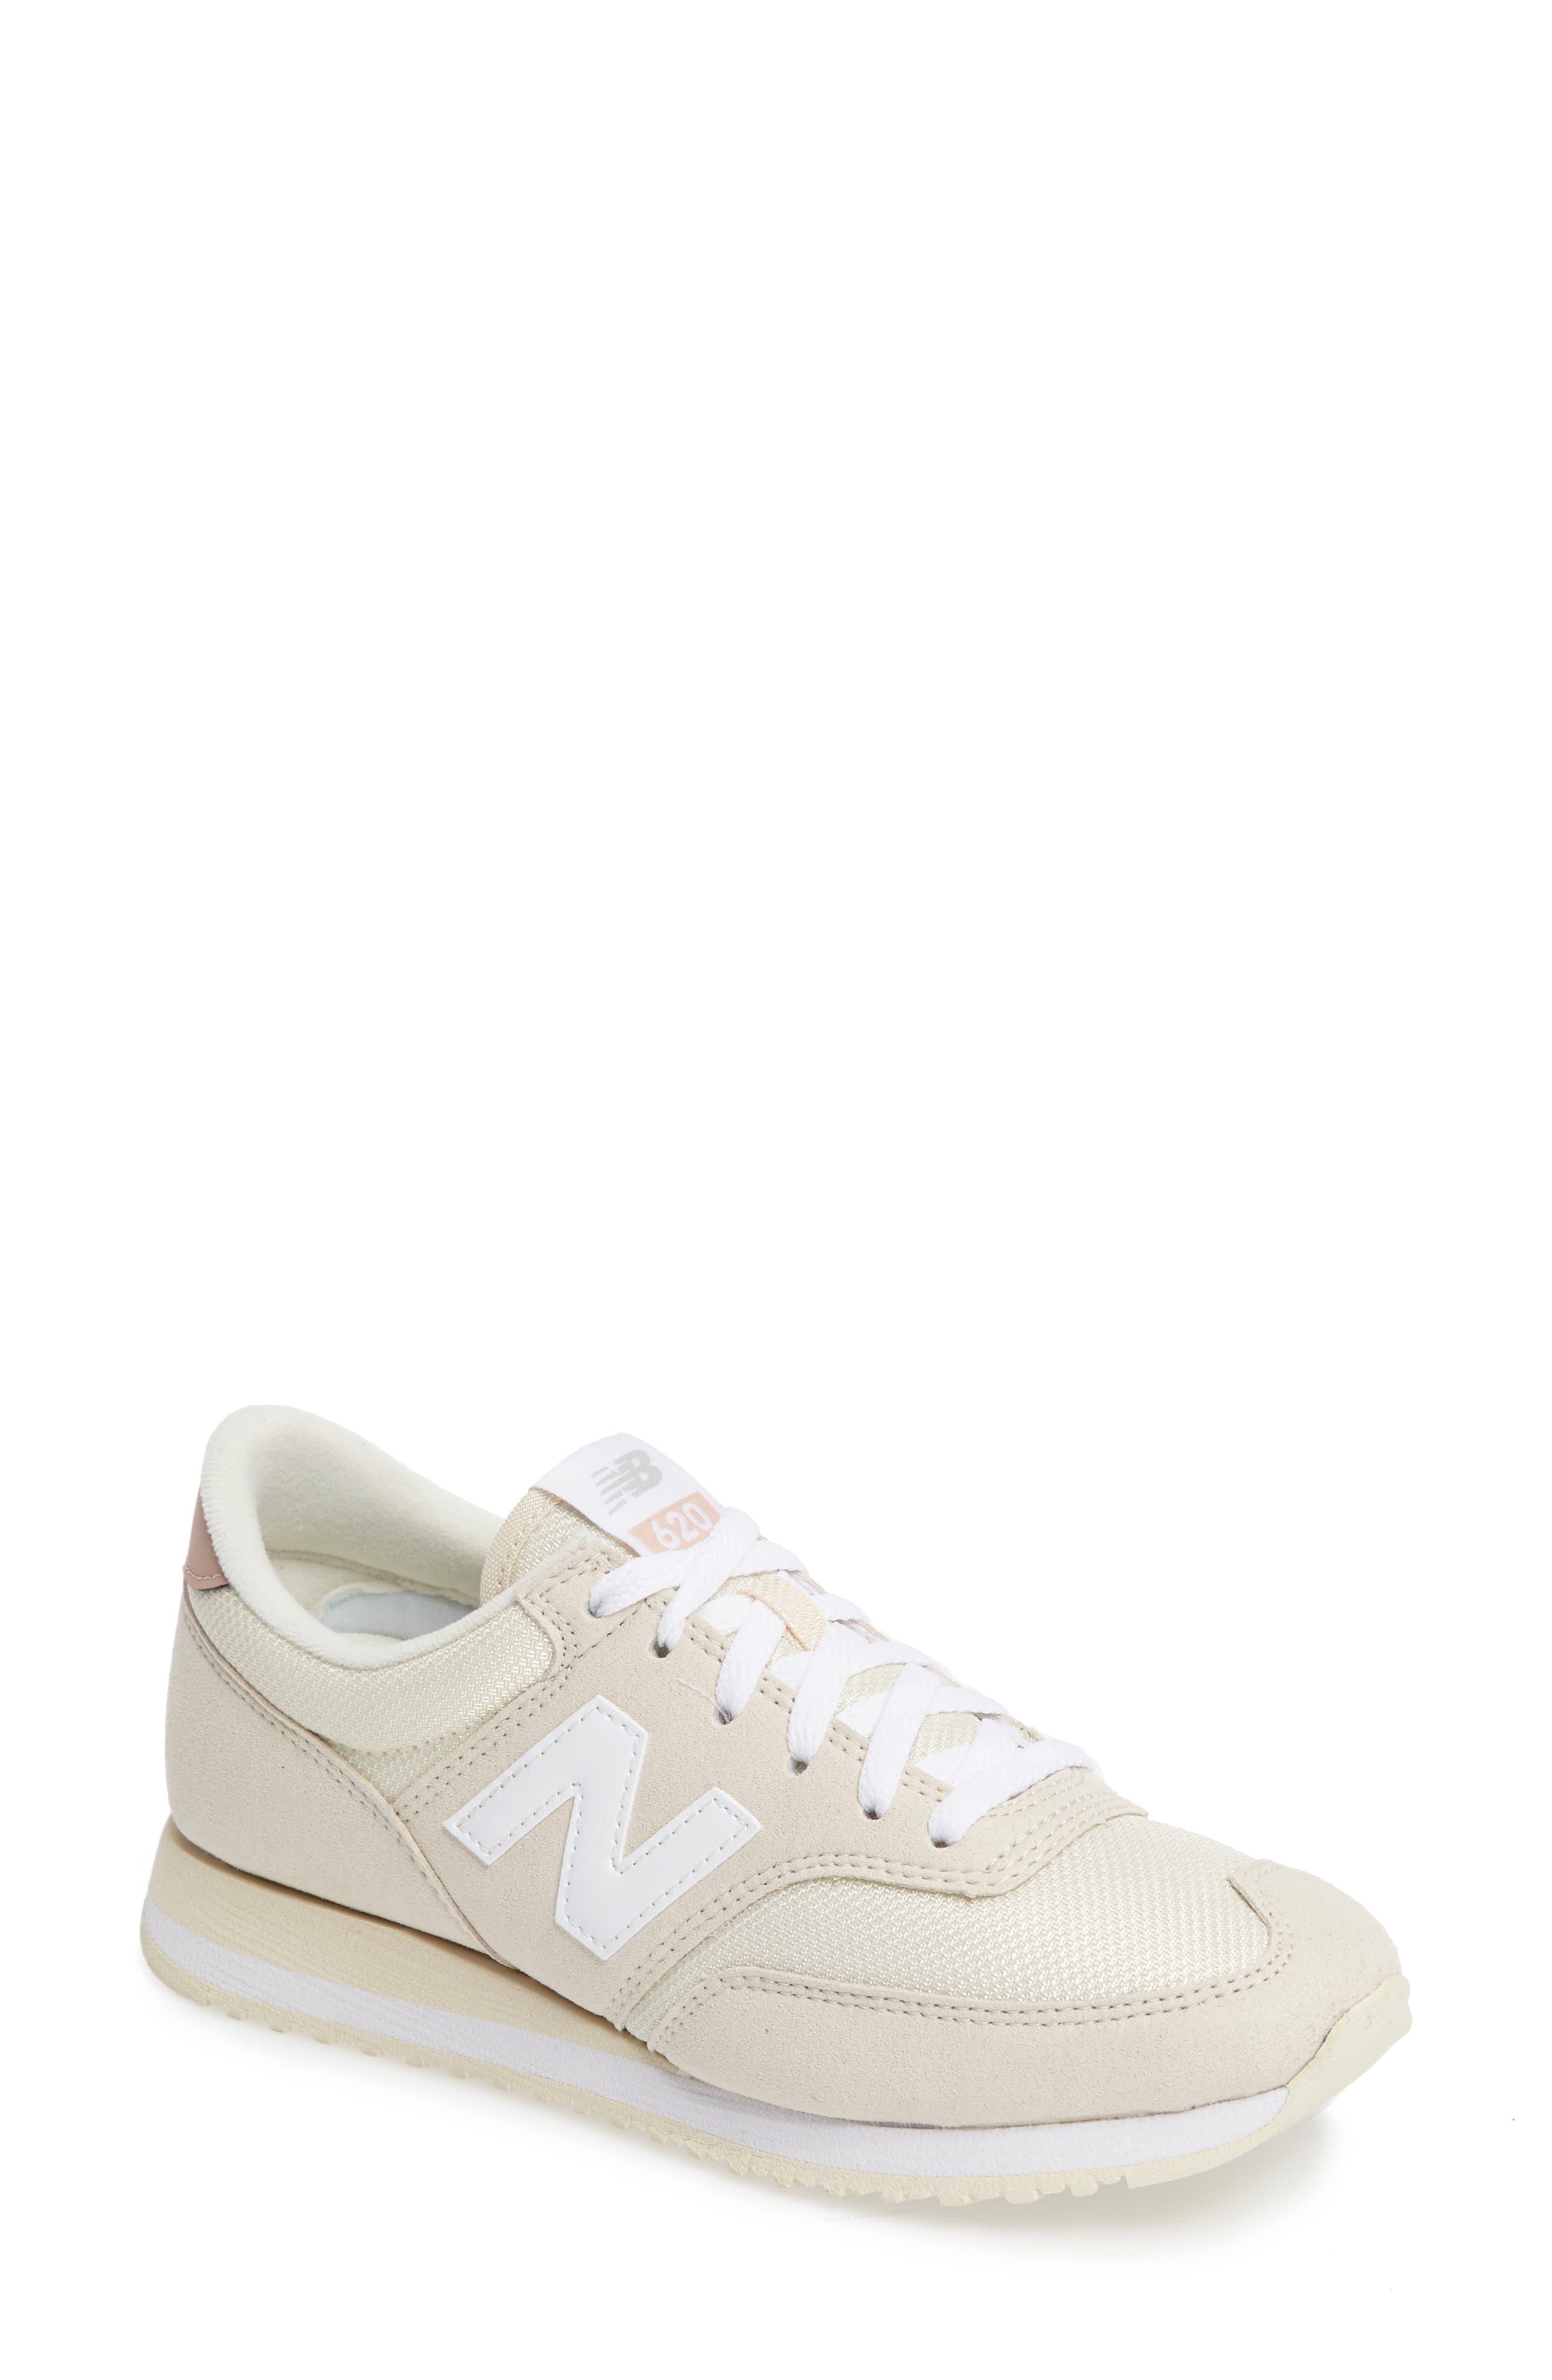 Alternate Image 1 Selected - New Balance '620' Sneaker (Women)